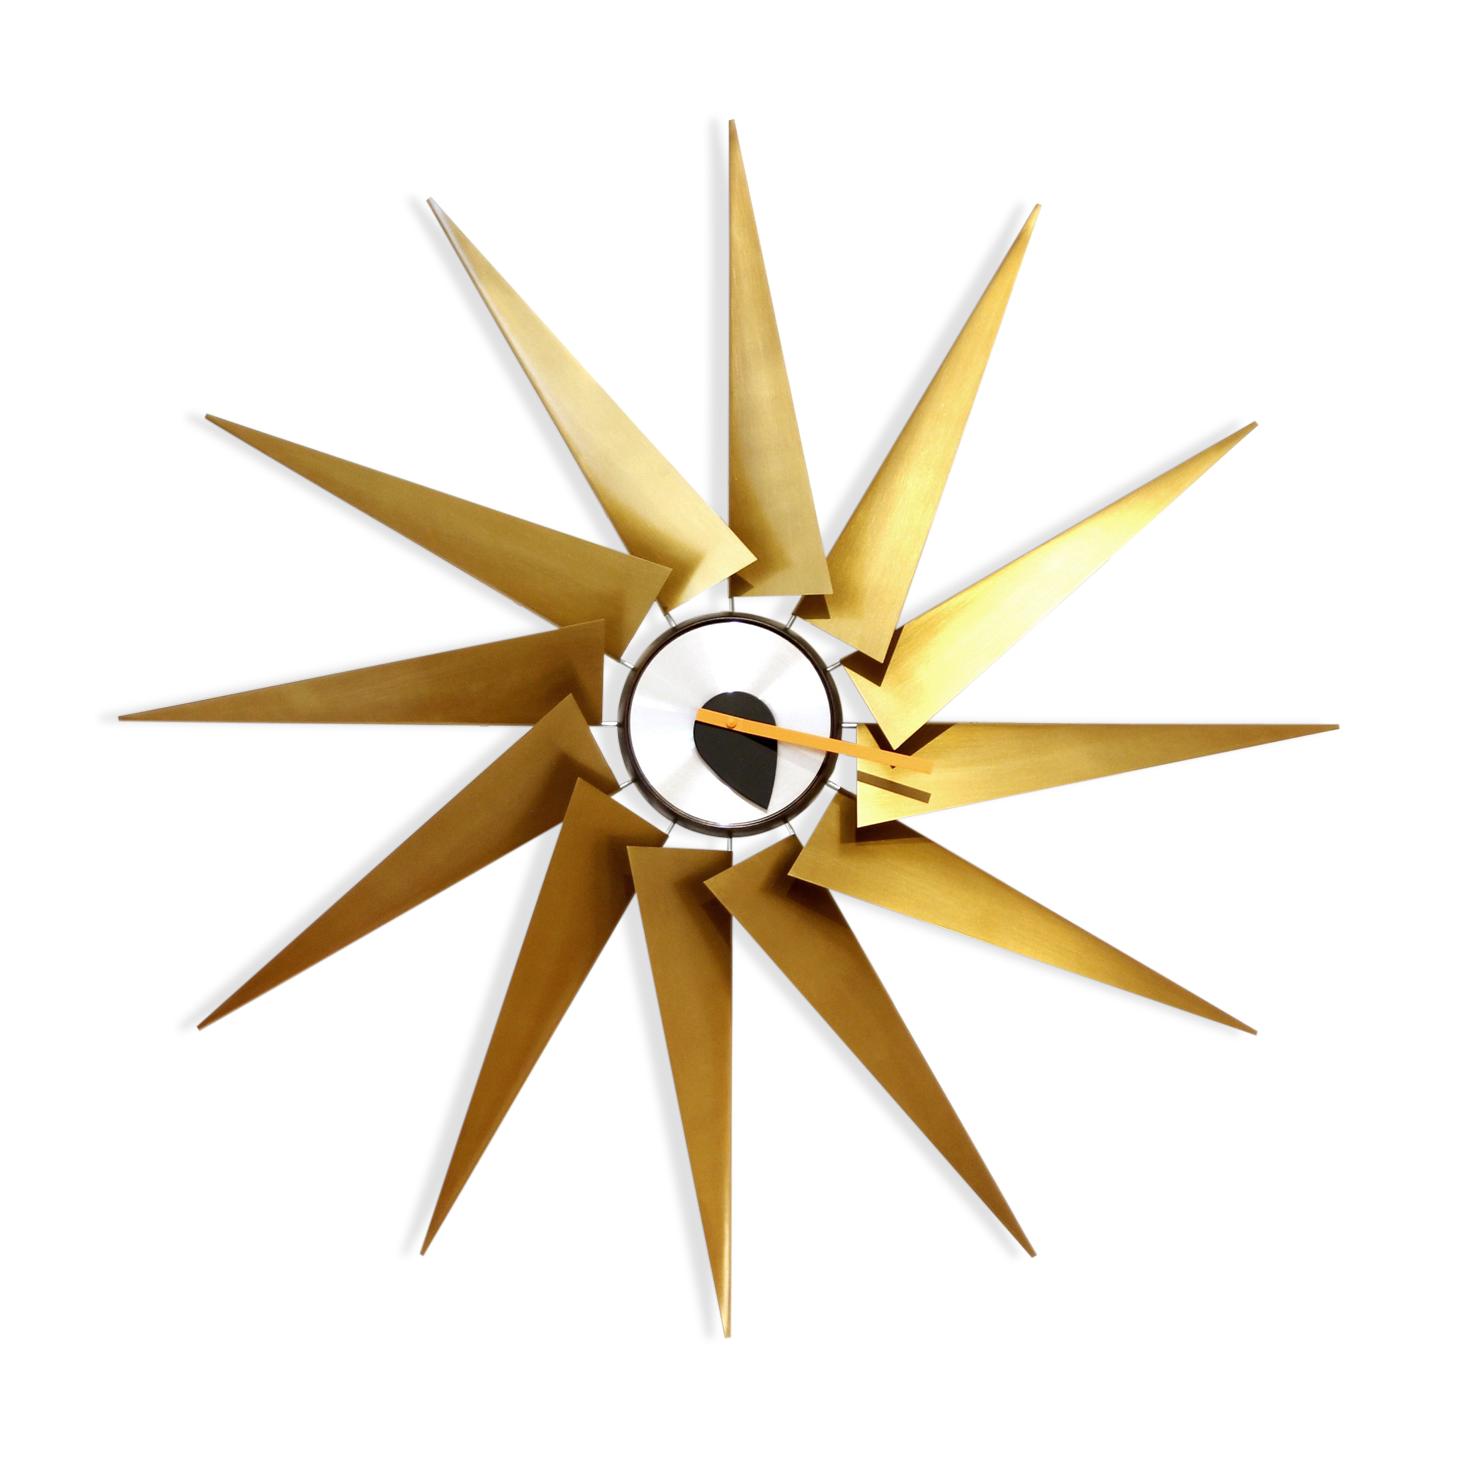 "horloge ""turbine"" george nelson - laiton - doré - design - b1hi5dr"